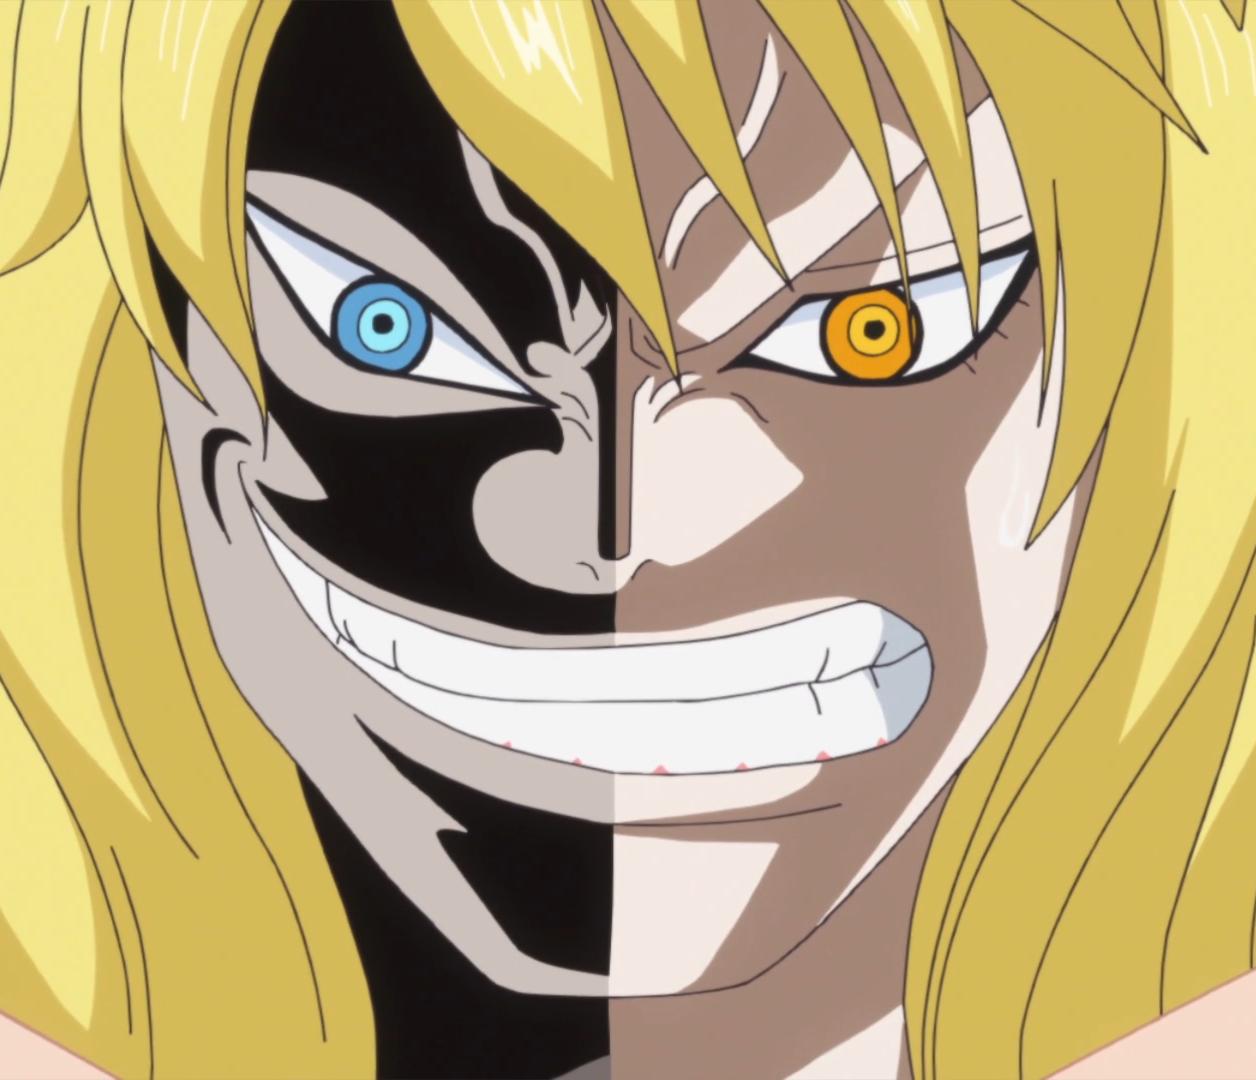 Cavendish - The One Piece Wiki - Manga, Anime, Pirates, Marines, Treasure, Devil Fruits, and more